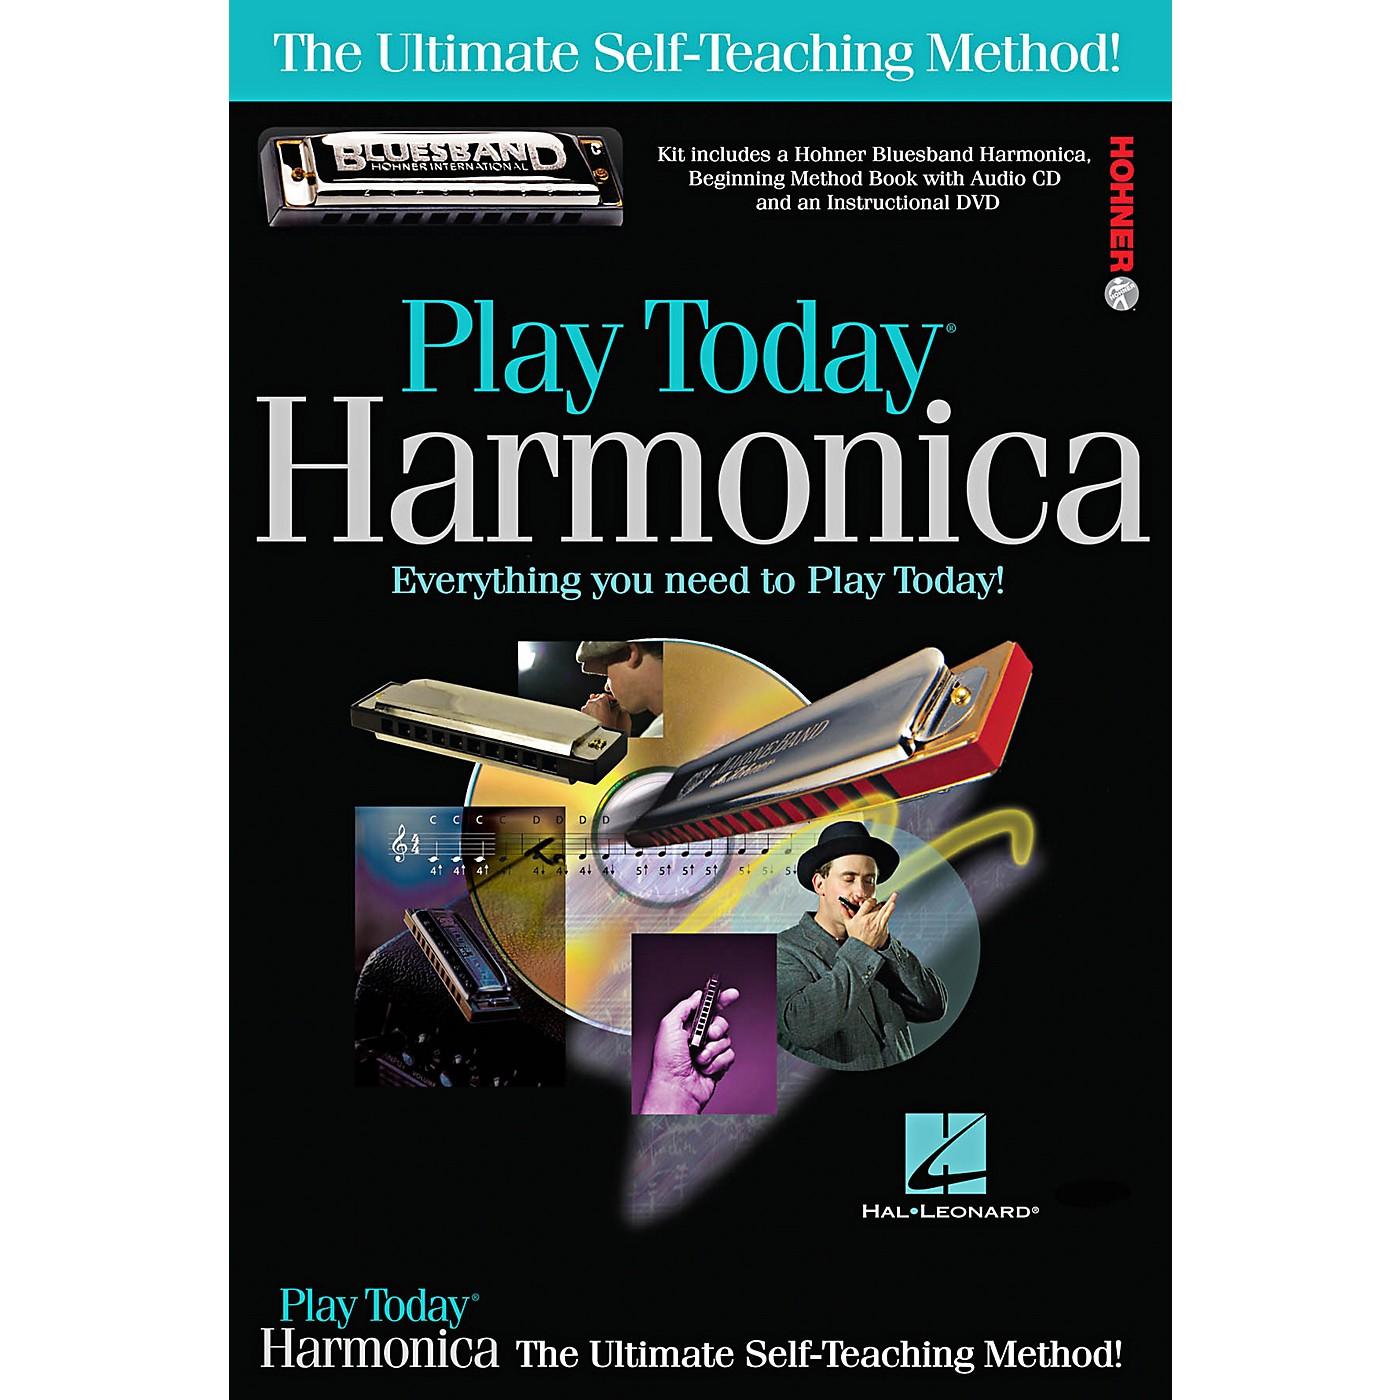 Hal Leonard Play Today Harmonica Complete Kit (Book/CD/DVD/Harmonica) thumbnail